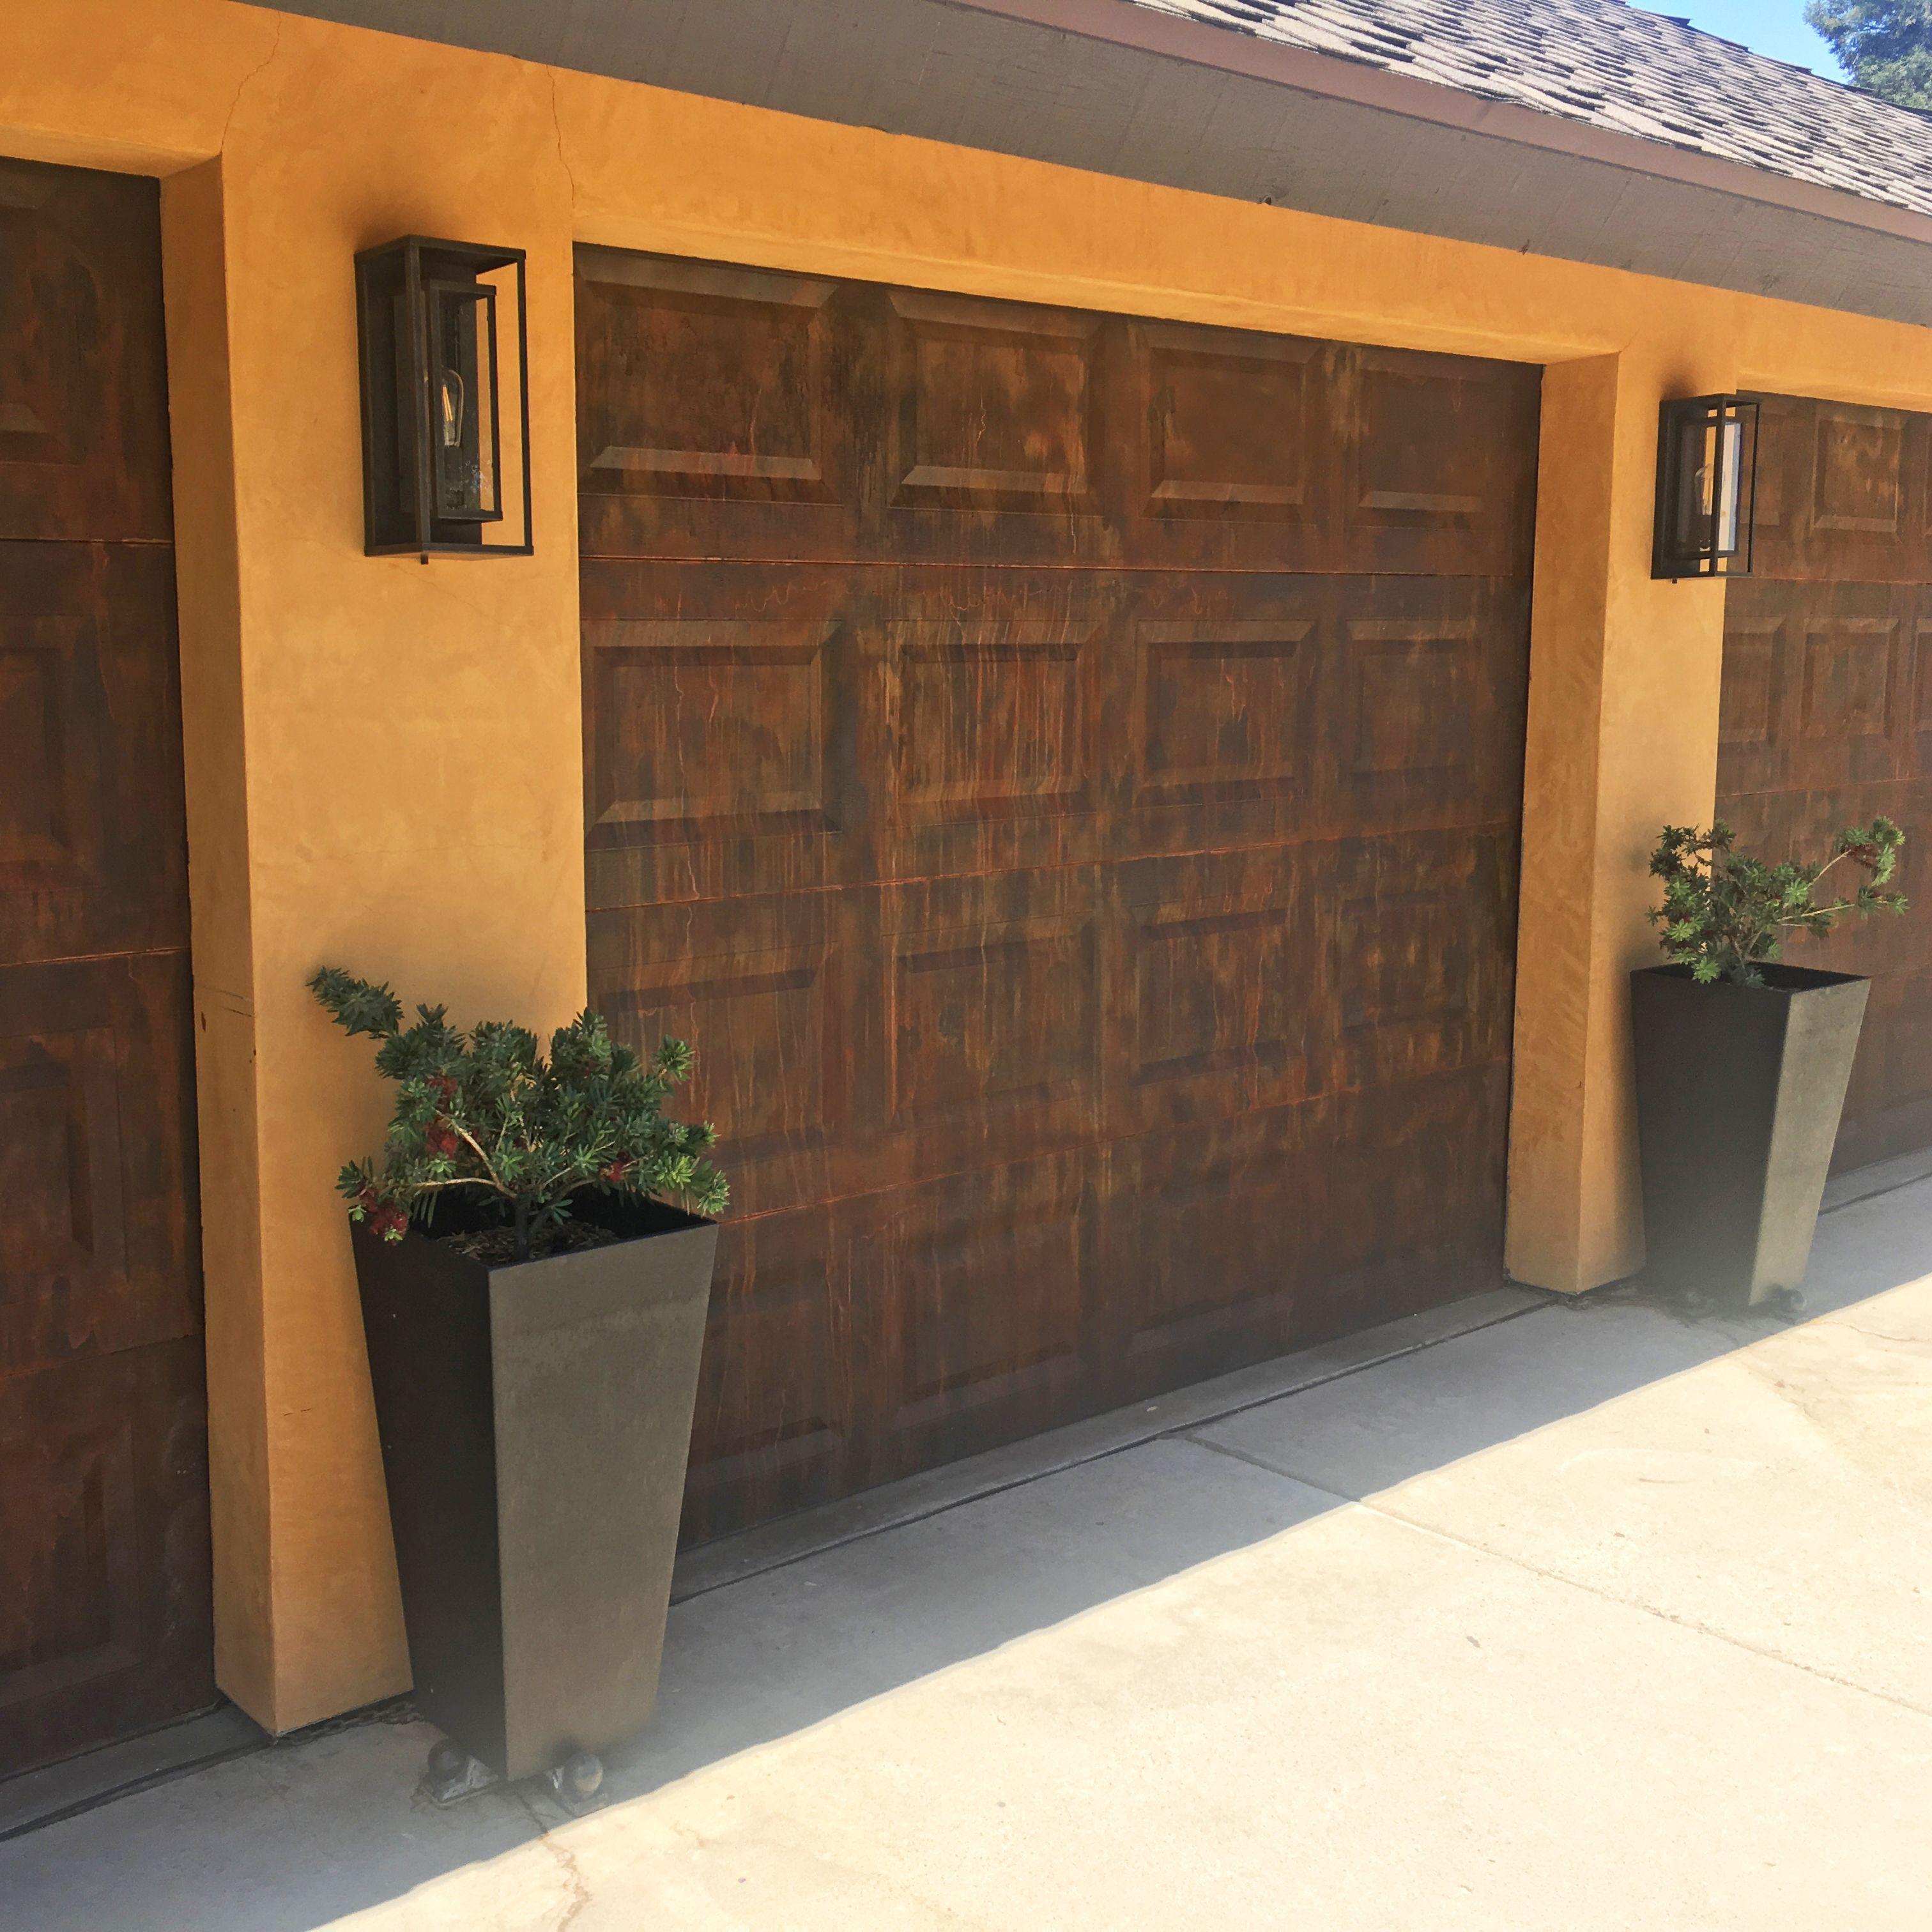 Garage Doors Finished In Modern Masters Metal Effects In Rust Project By Brenda Allison Art Weathered Rust Finish Patina Garage Doors Doors Garage Design